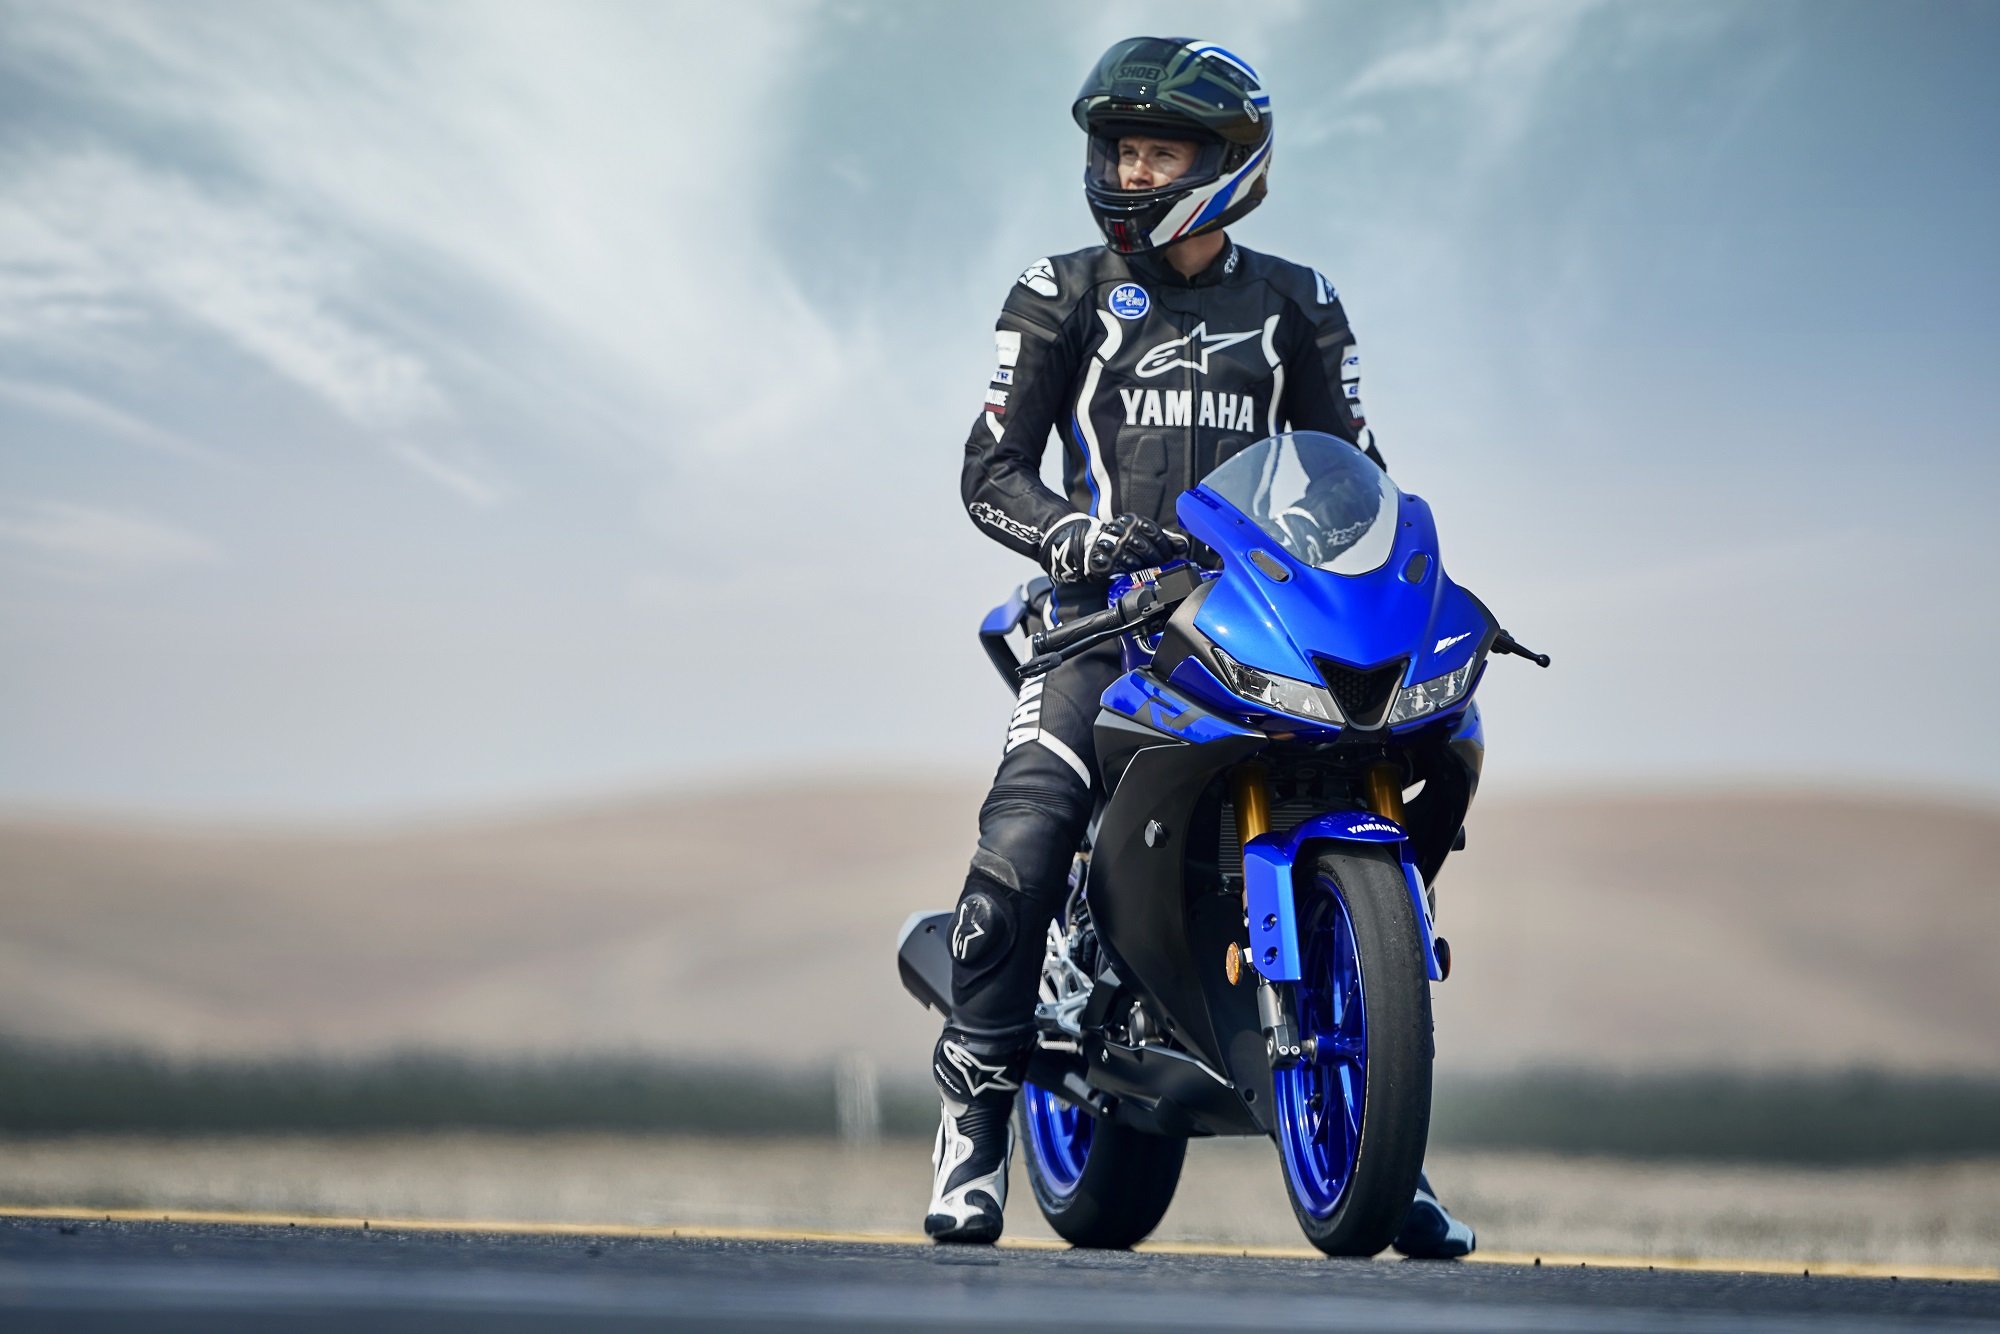 Nuova Yamaha Yzf R125 2019 Piu Veloce E Precisa Motoritalia Org